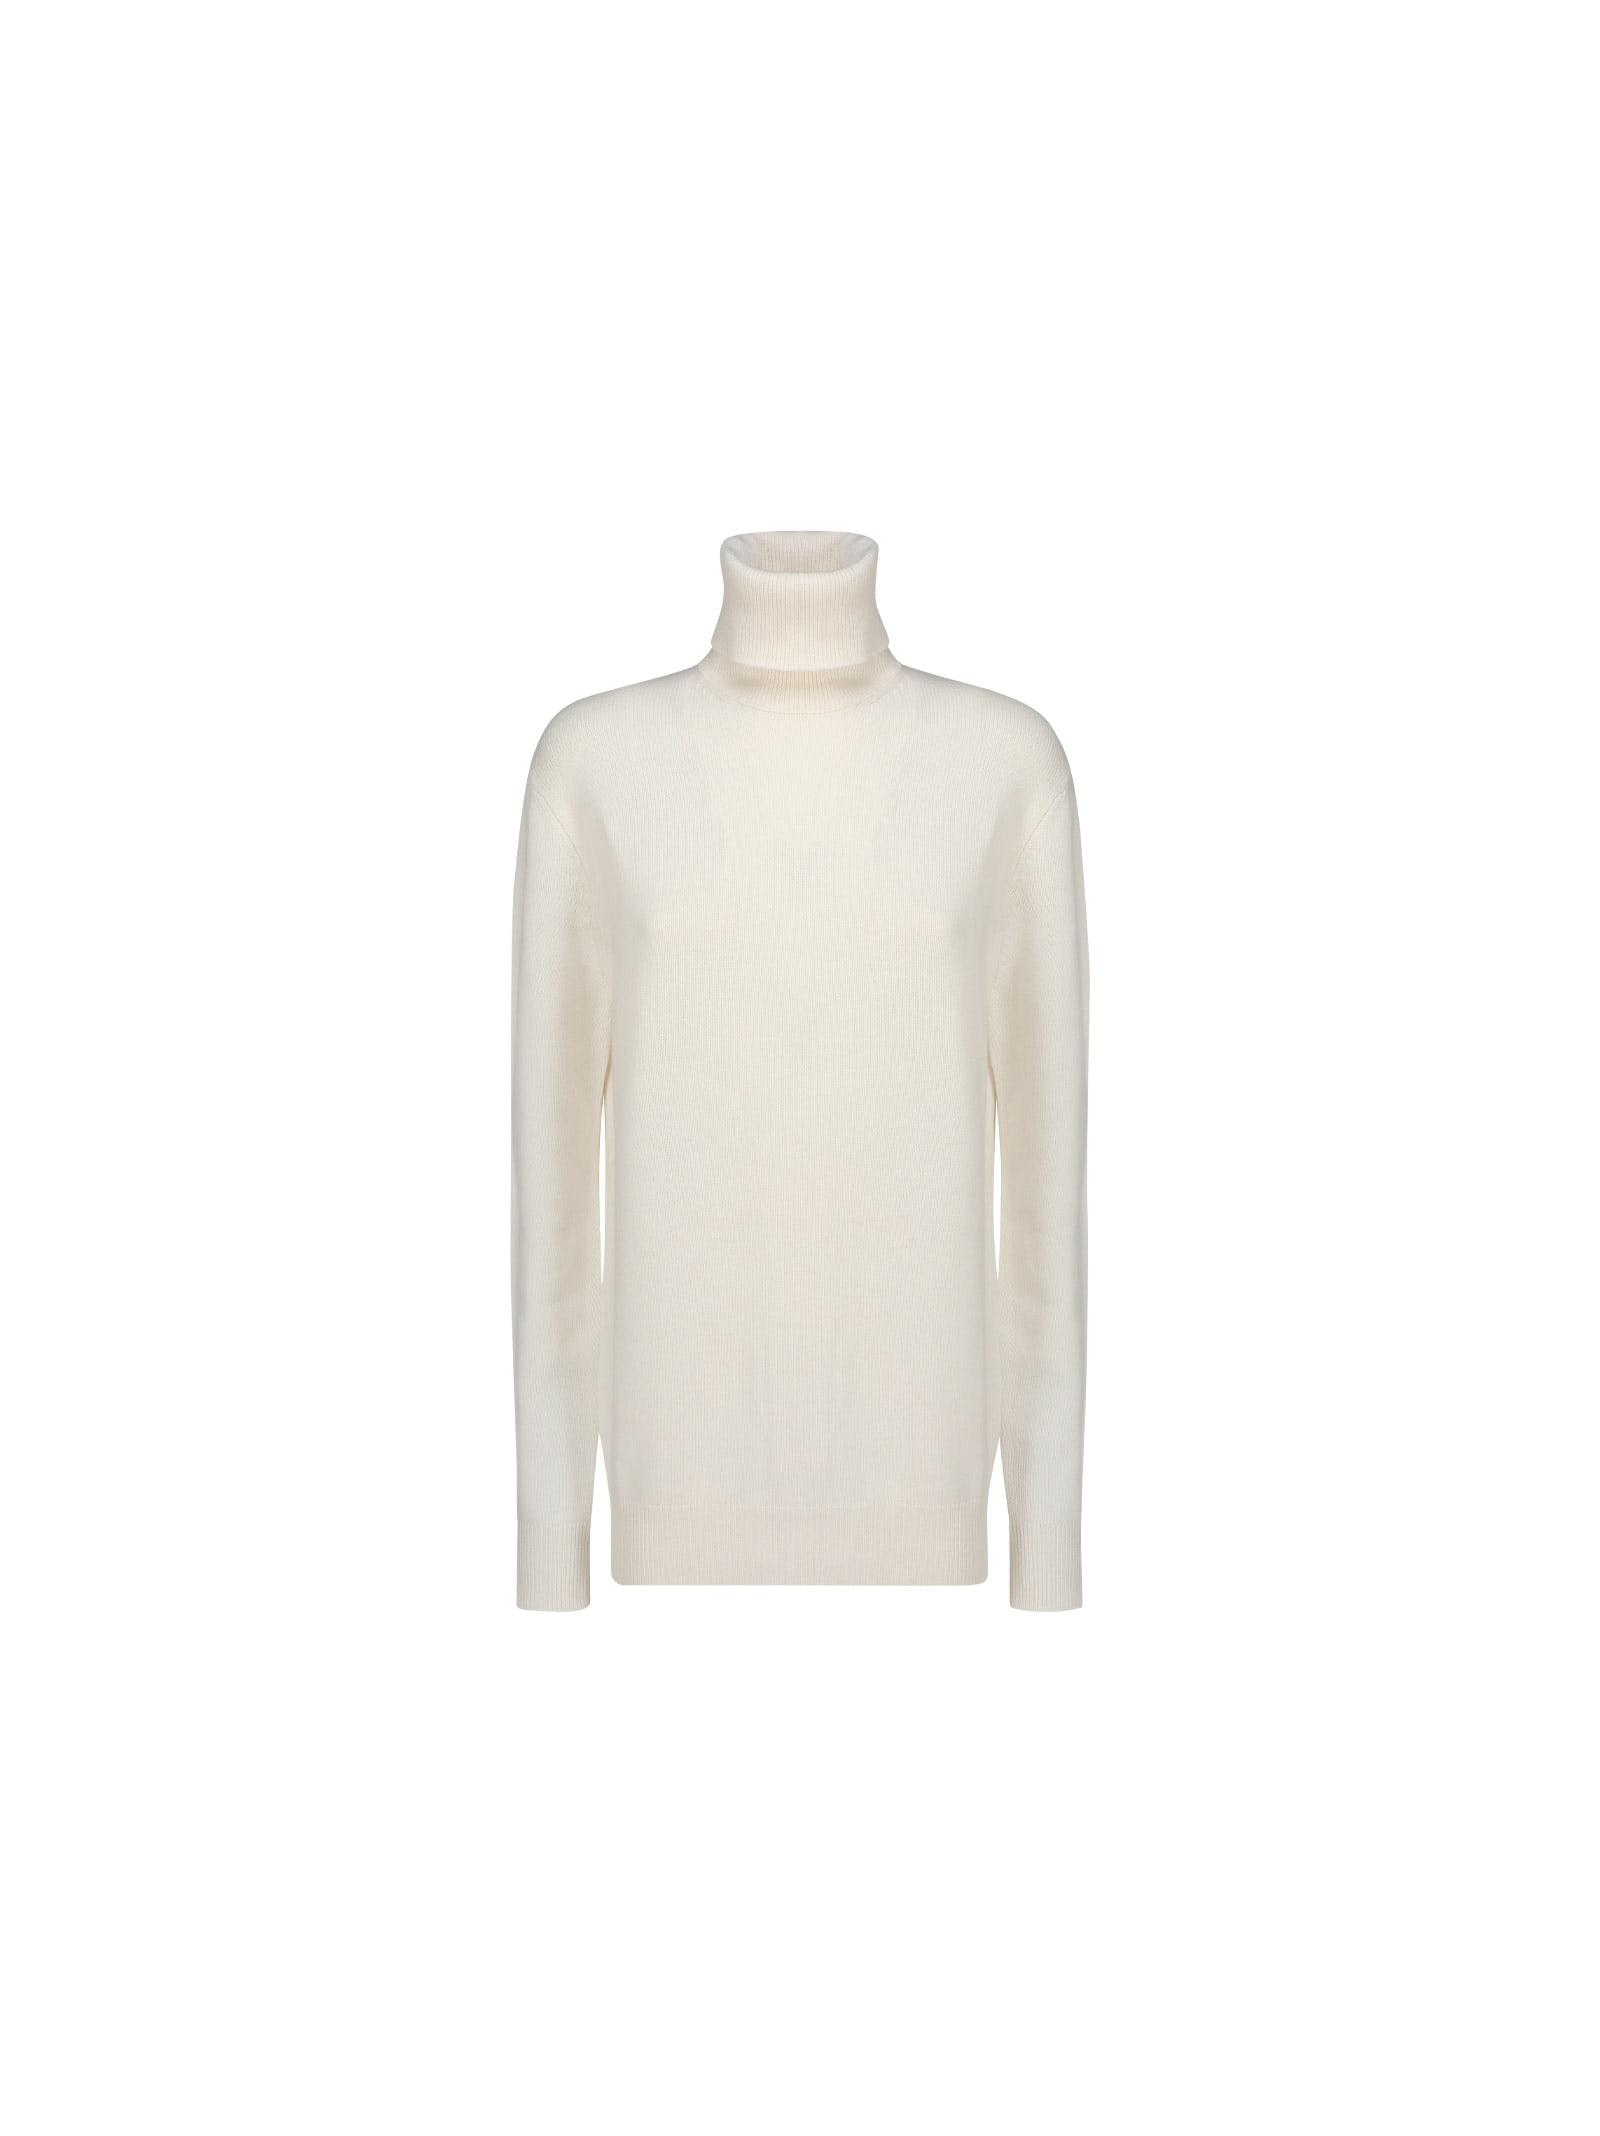 White Cashmere Turtleneck Knitwear by Dolce & Gabbana, high neck, long sleeves, elastic on bottom, brand logo inside label. Composition: 100% Cashmere